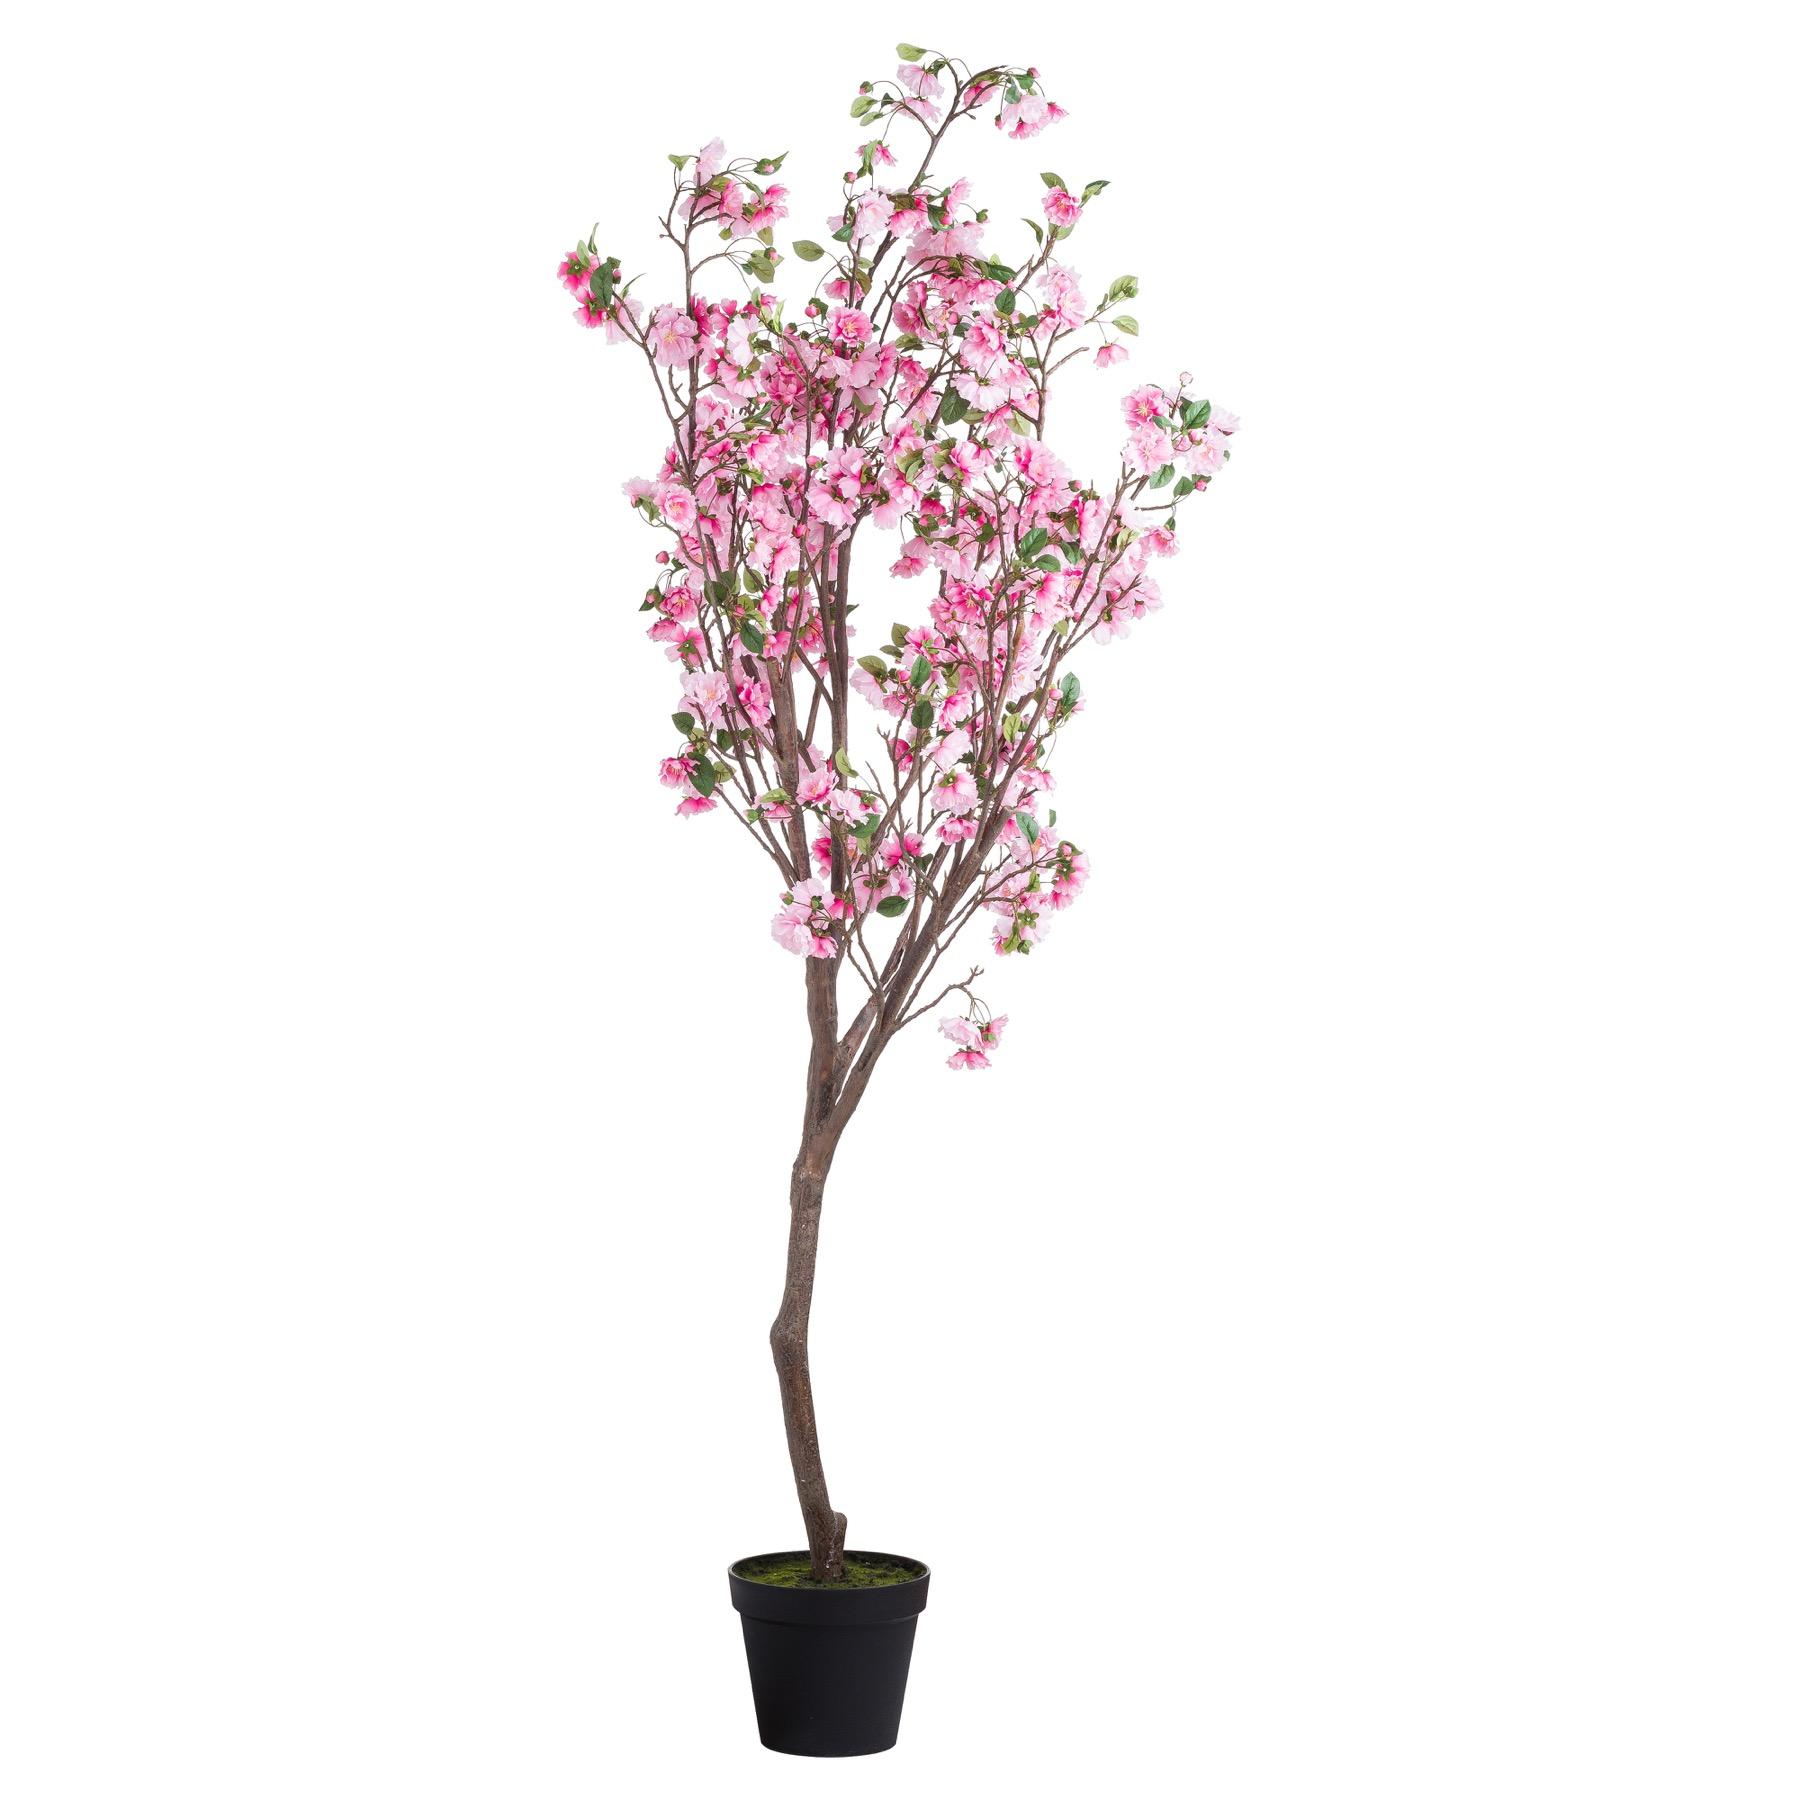 Large Cherry Blossom Tree - Image 1